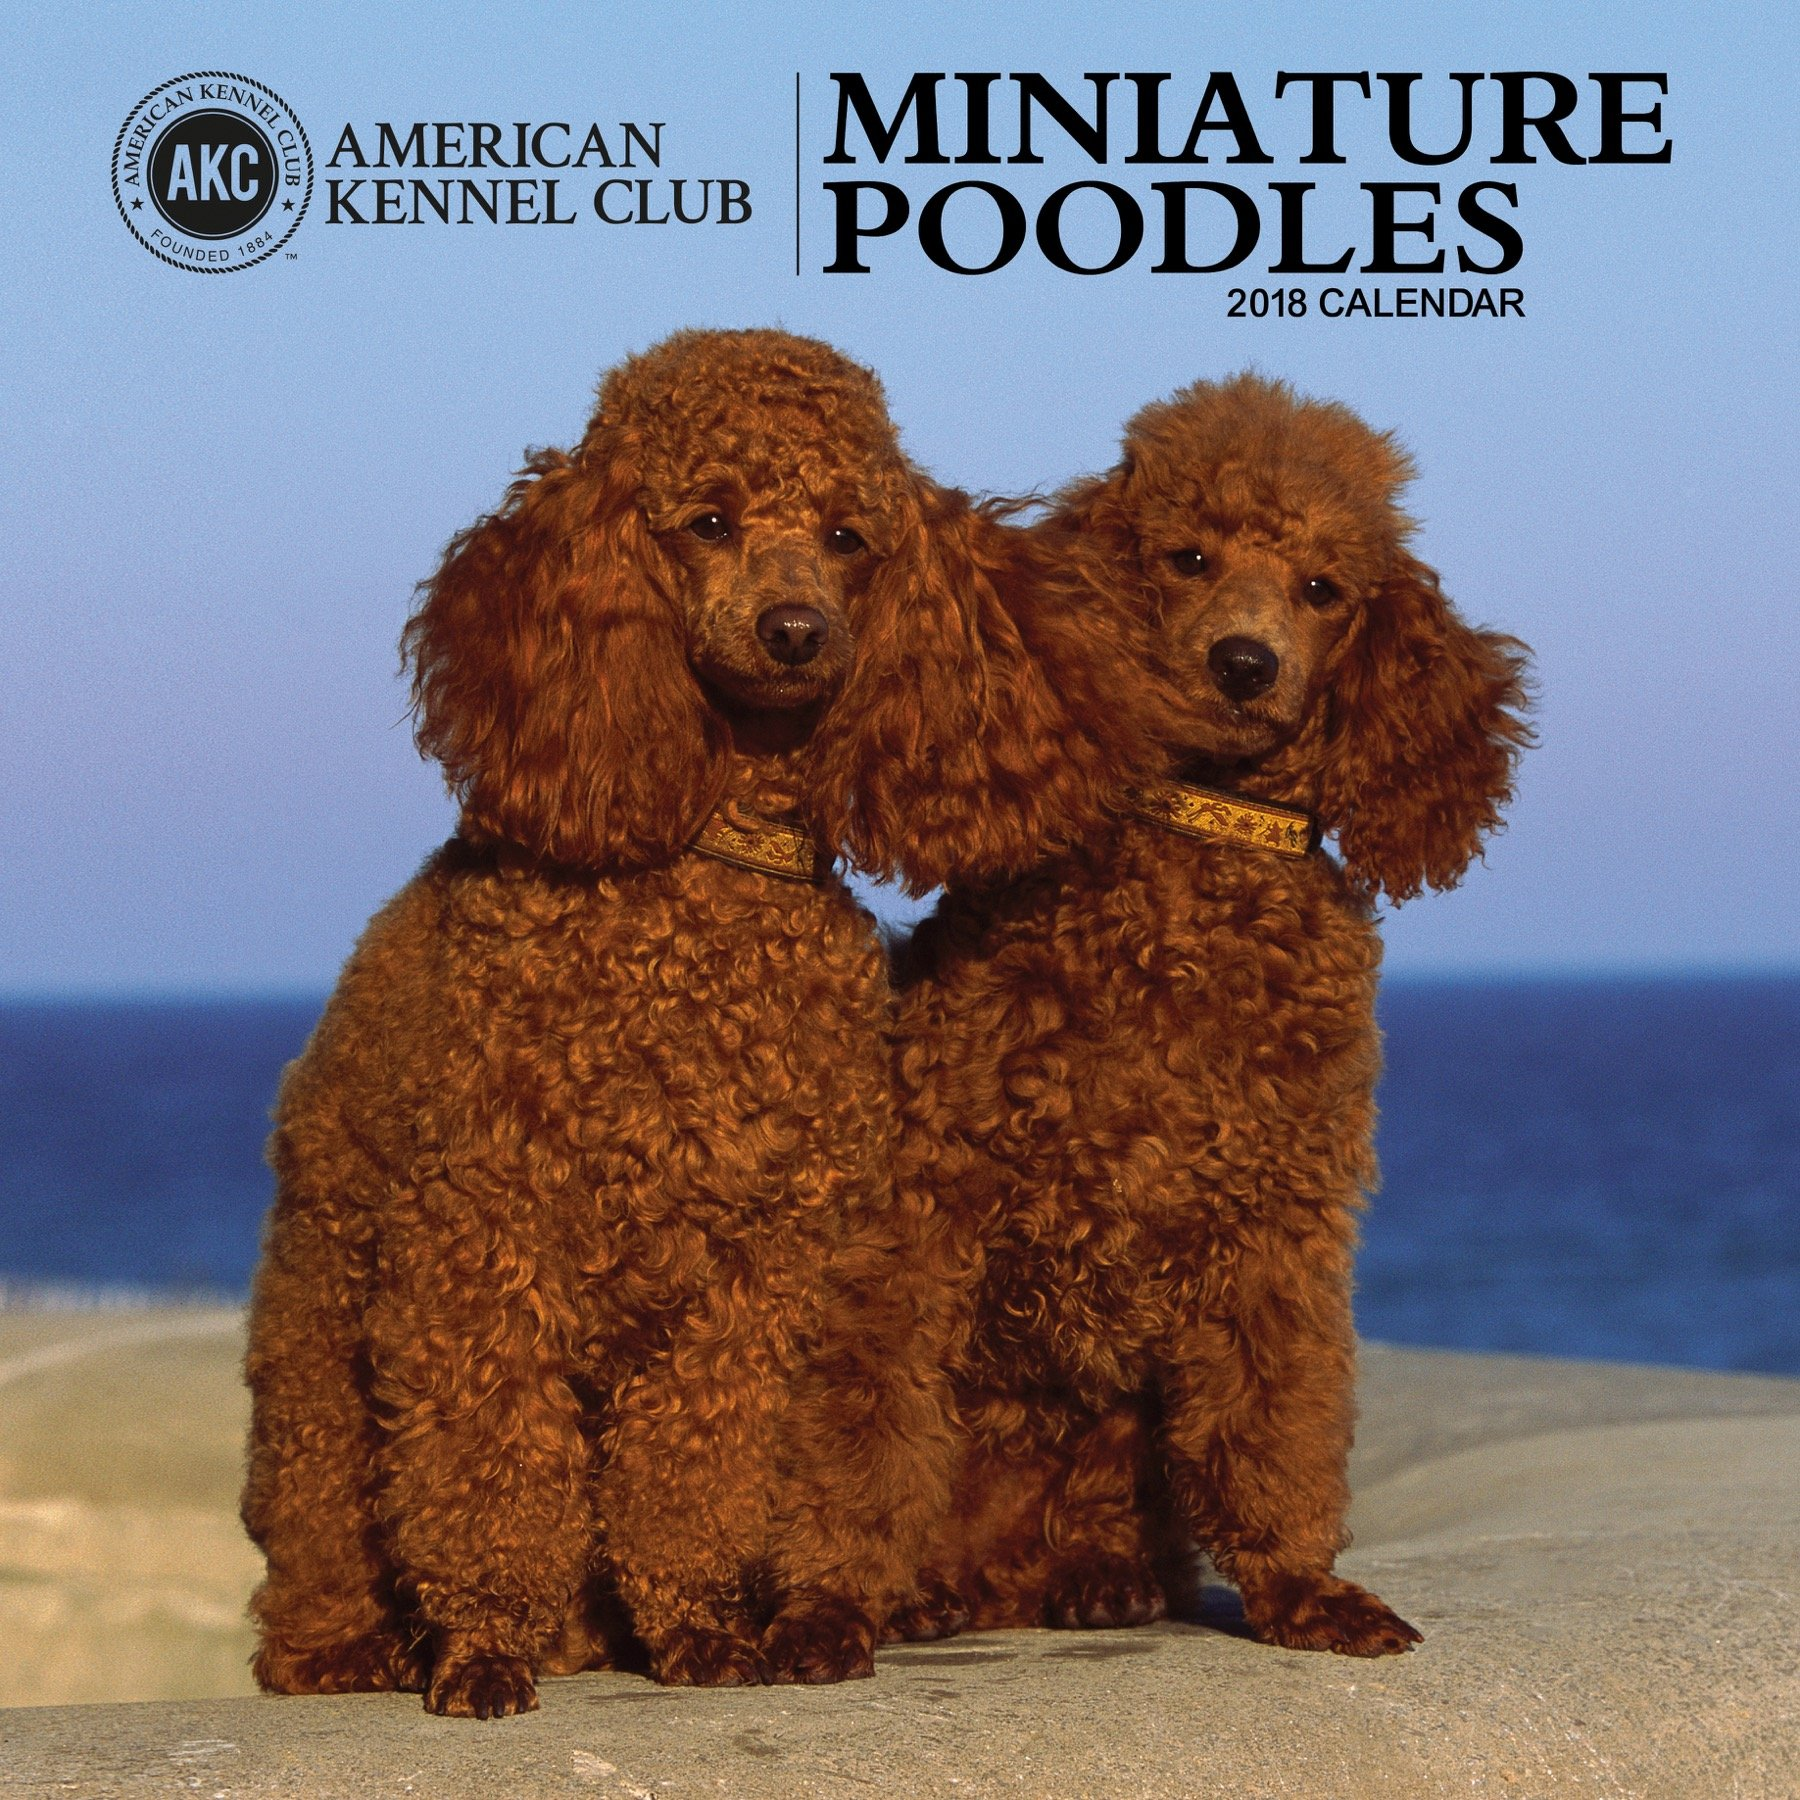 American Kennel Club Miniature Poodles 2018 Wall Calendar